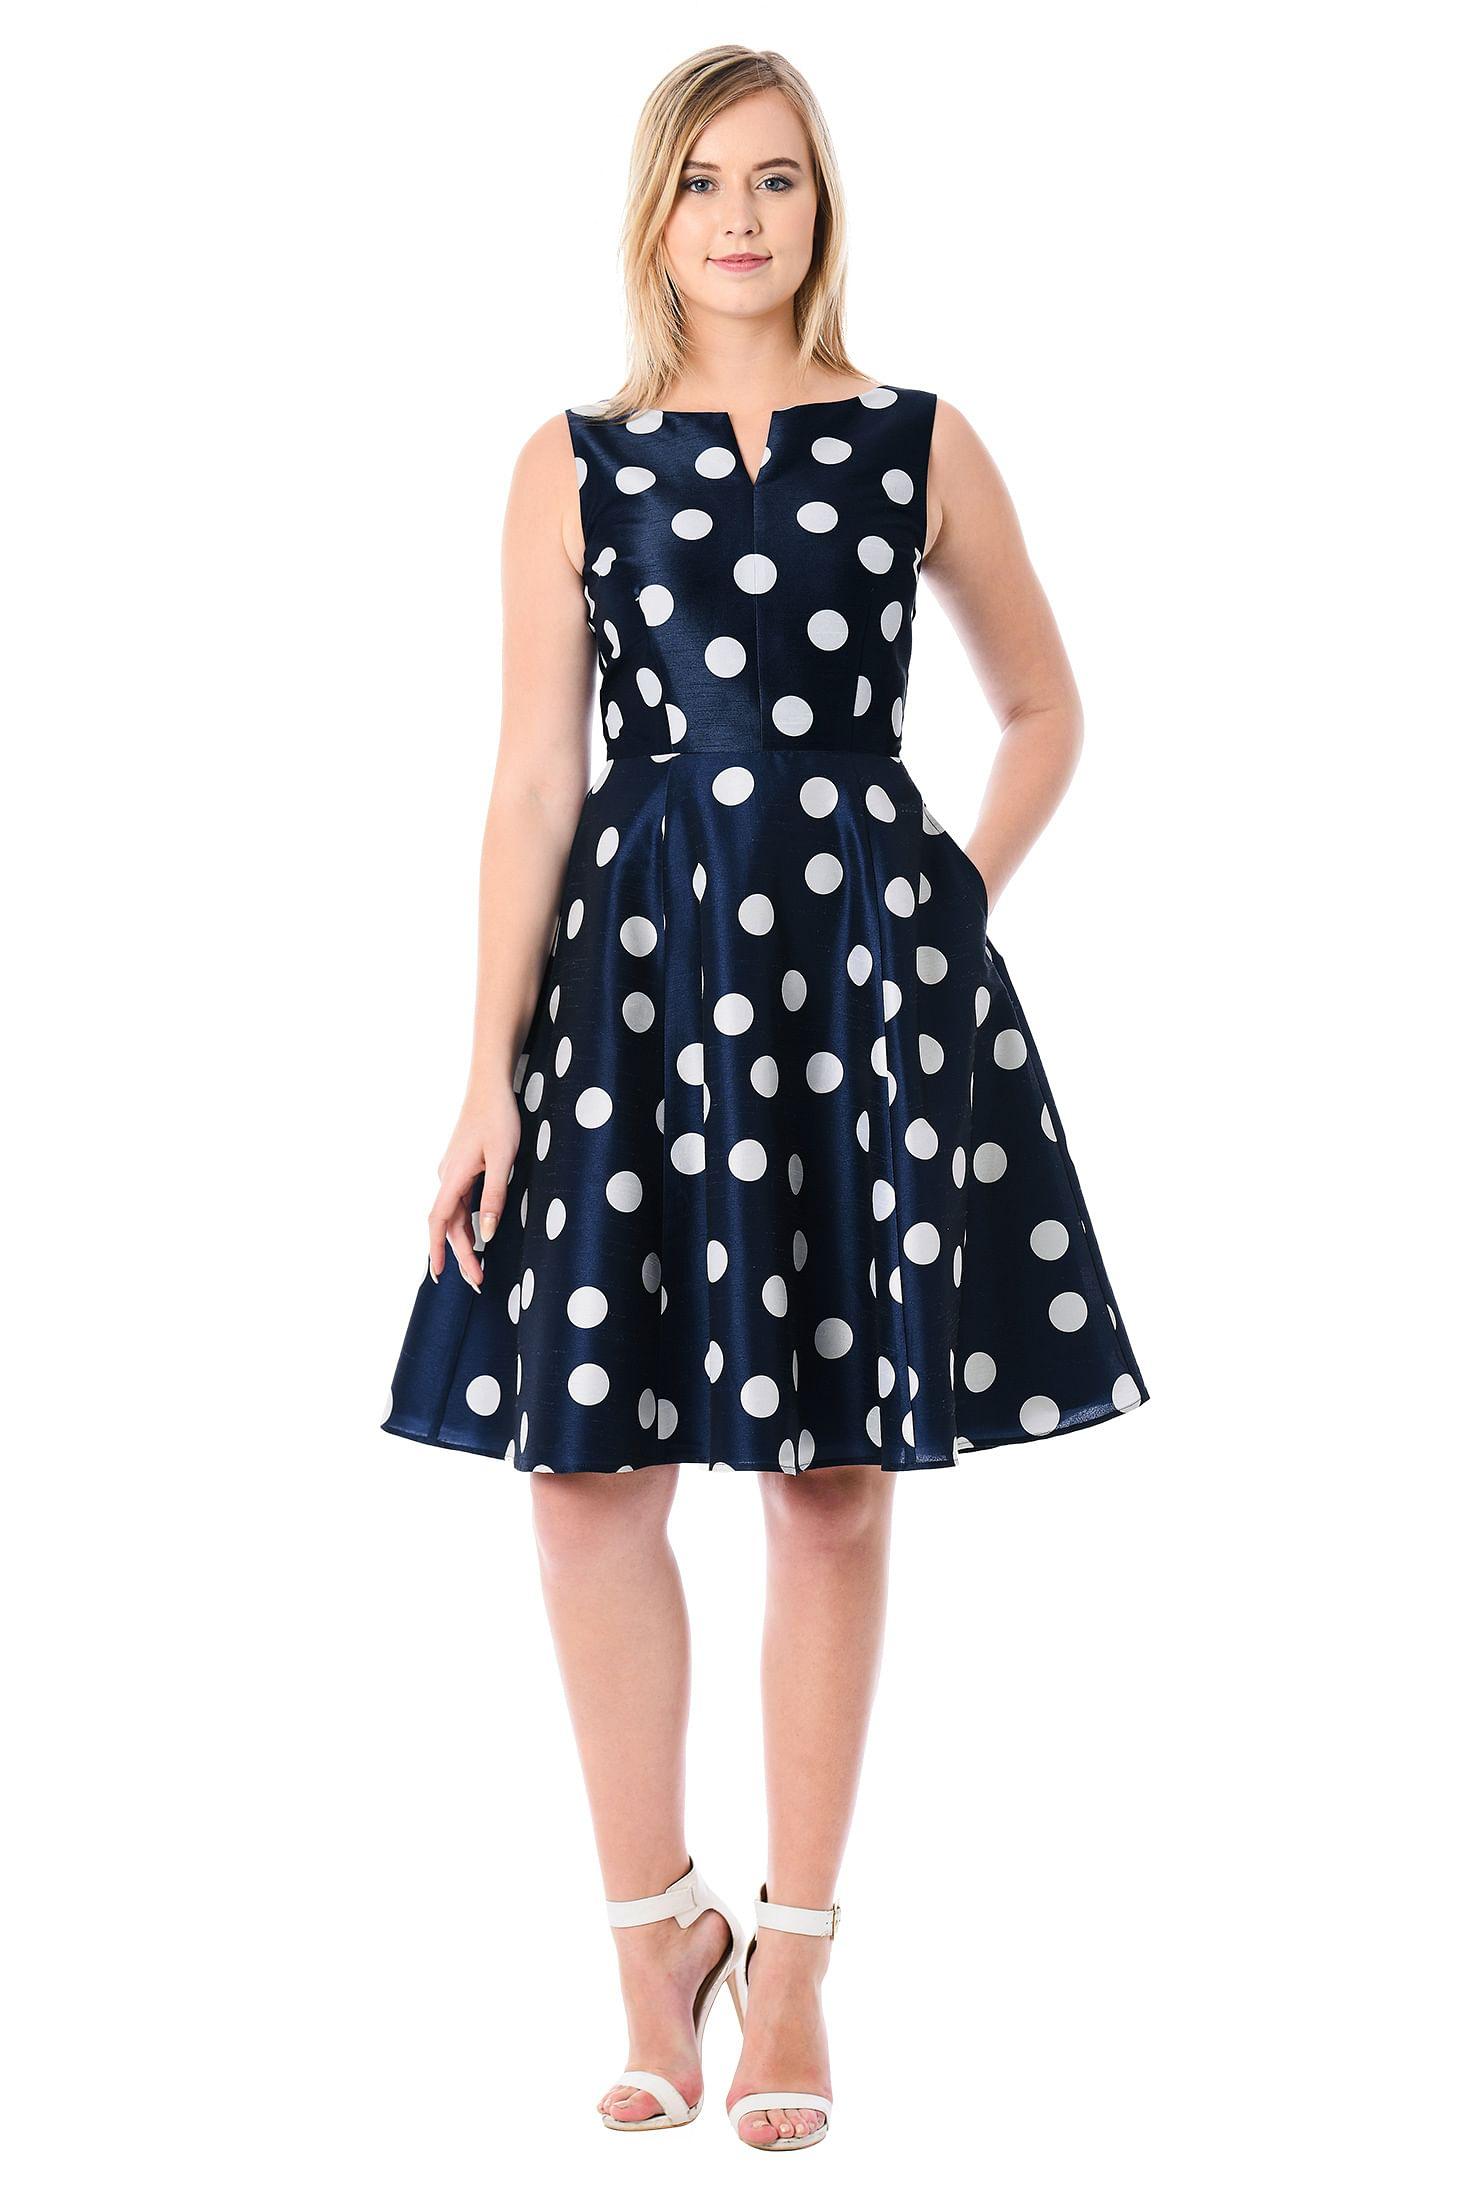 fa3bf79faab back zip dresses, boat neck dresses, Dry clean dresses, flared skirt dresses